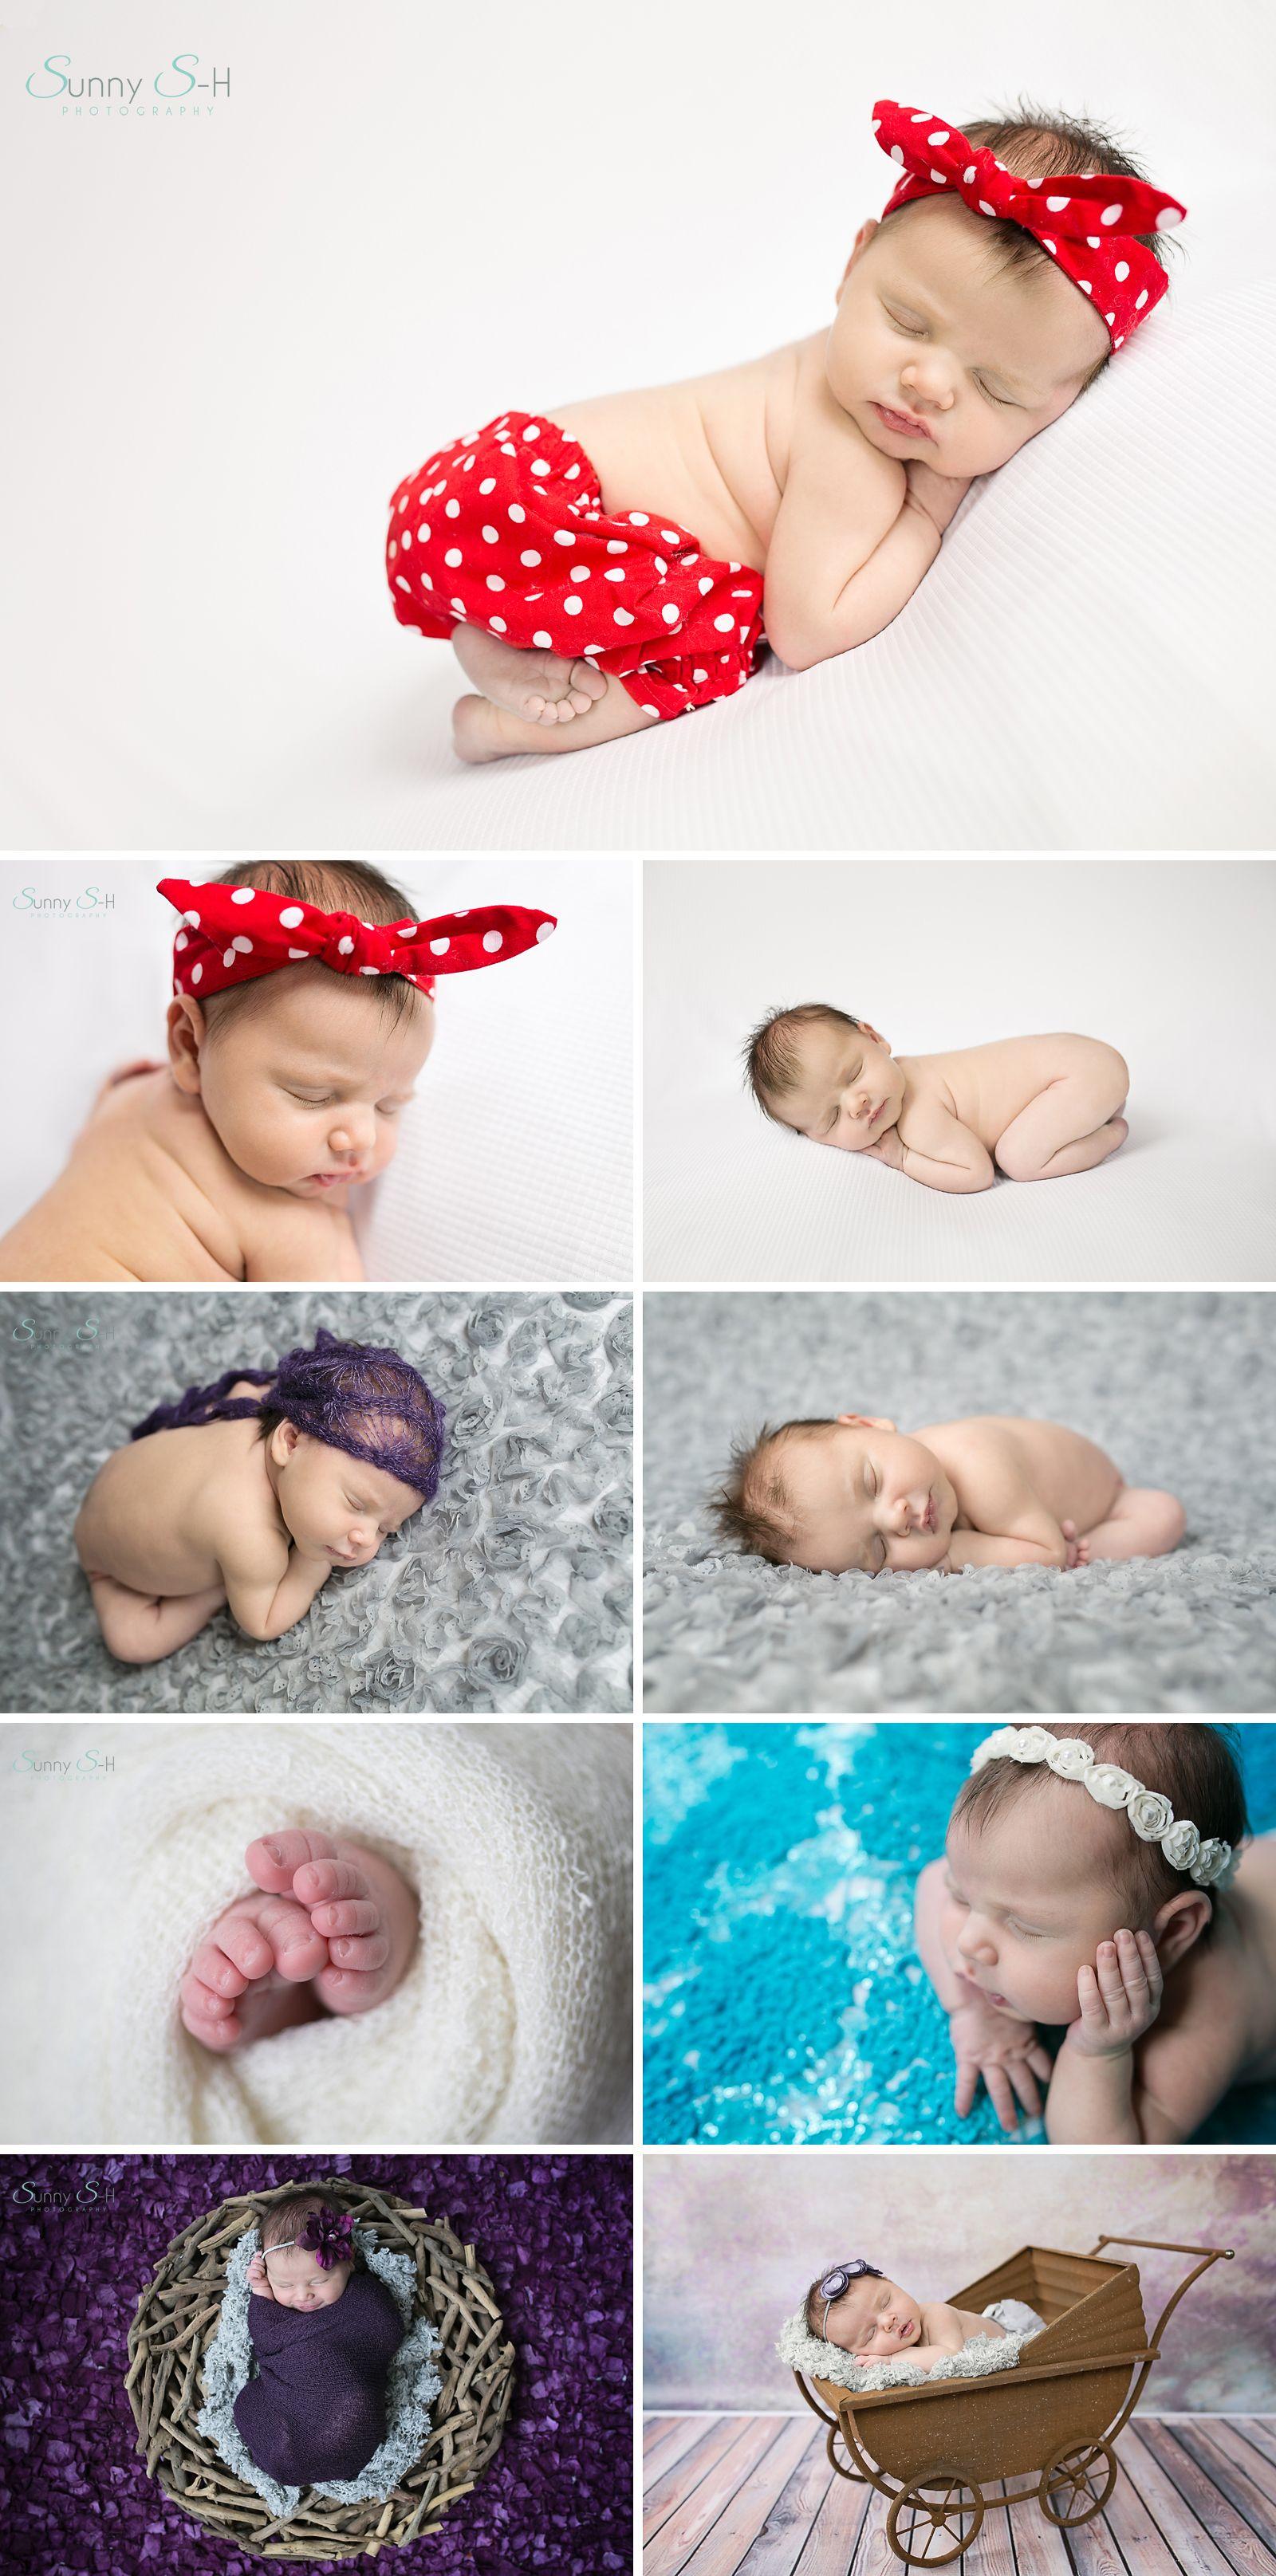 Baby Girl Photoshoot Ideas At Home : photoshoot, ideas, Newborn, Photoshoot, Ideas